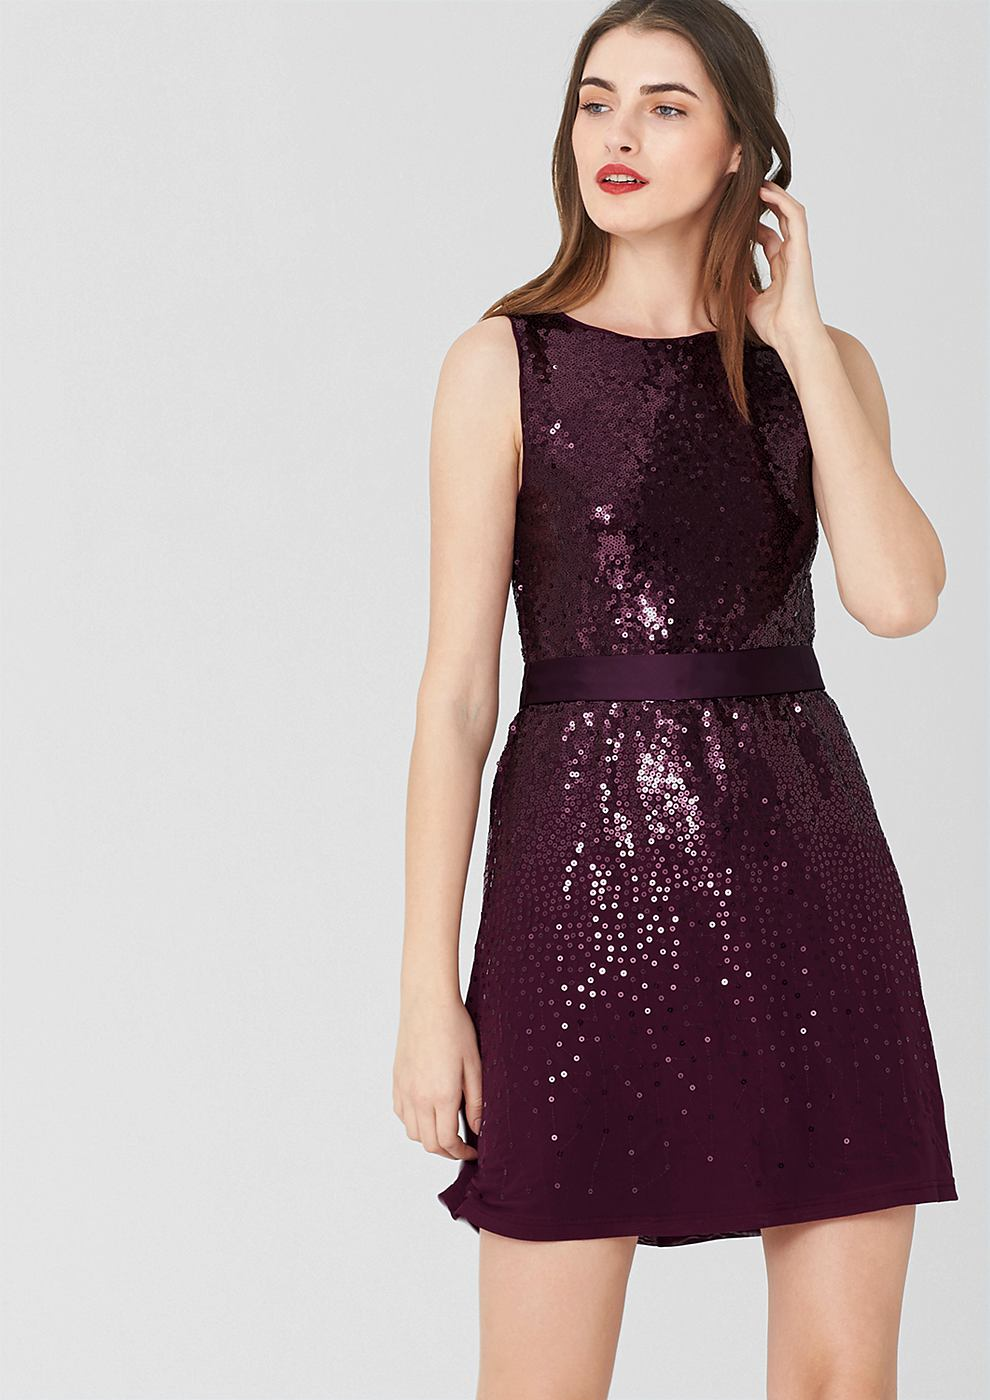 s.Oliver Premium jurk met pailletjes en bindkoord rood